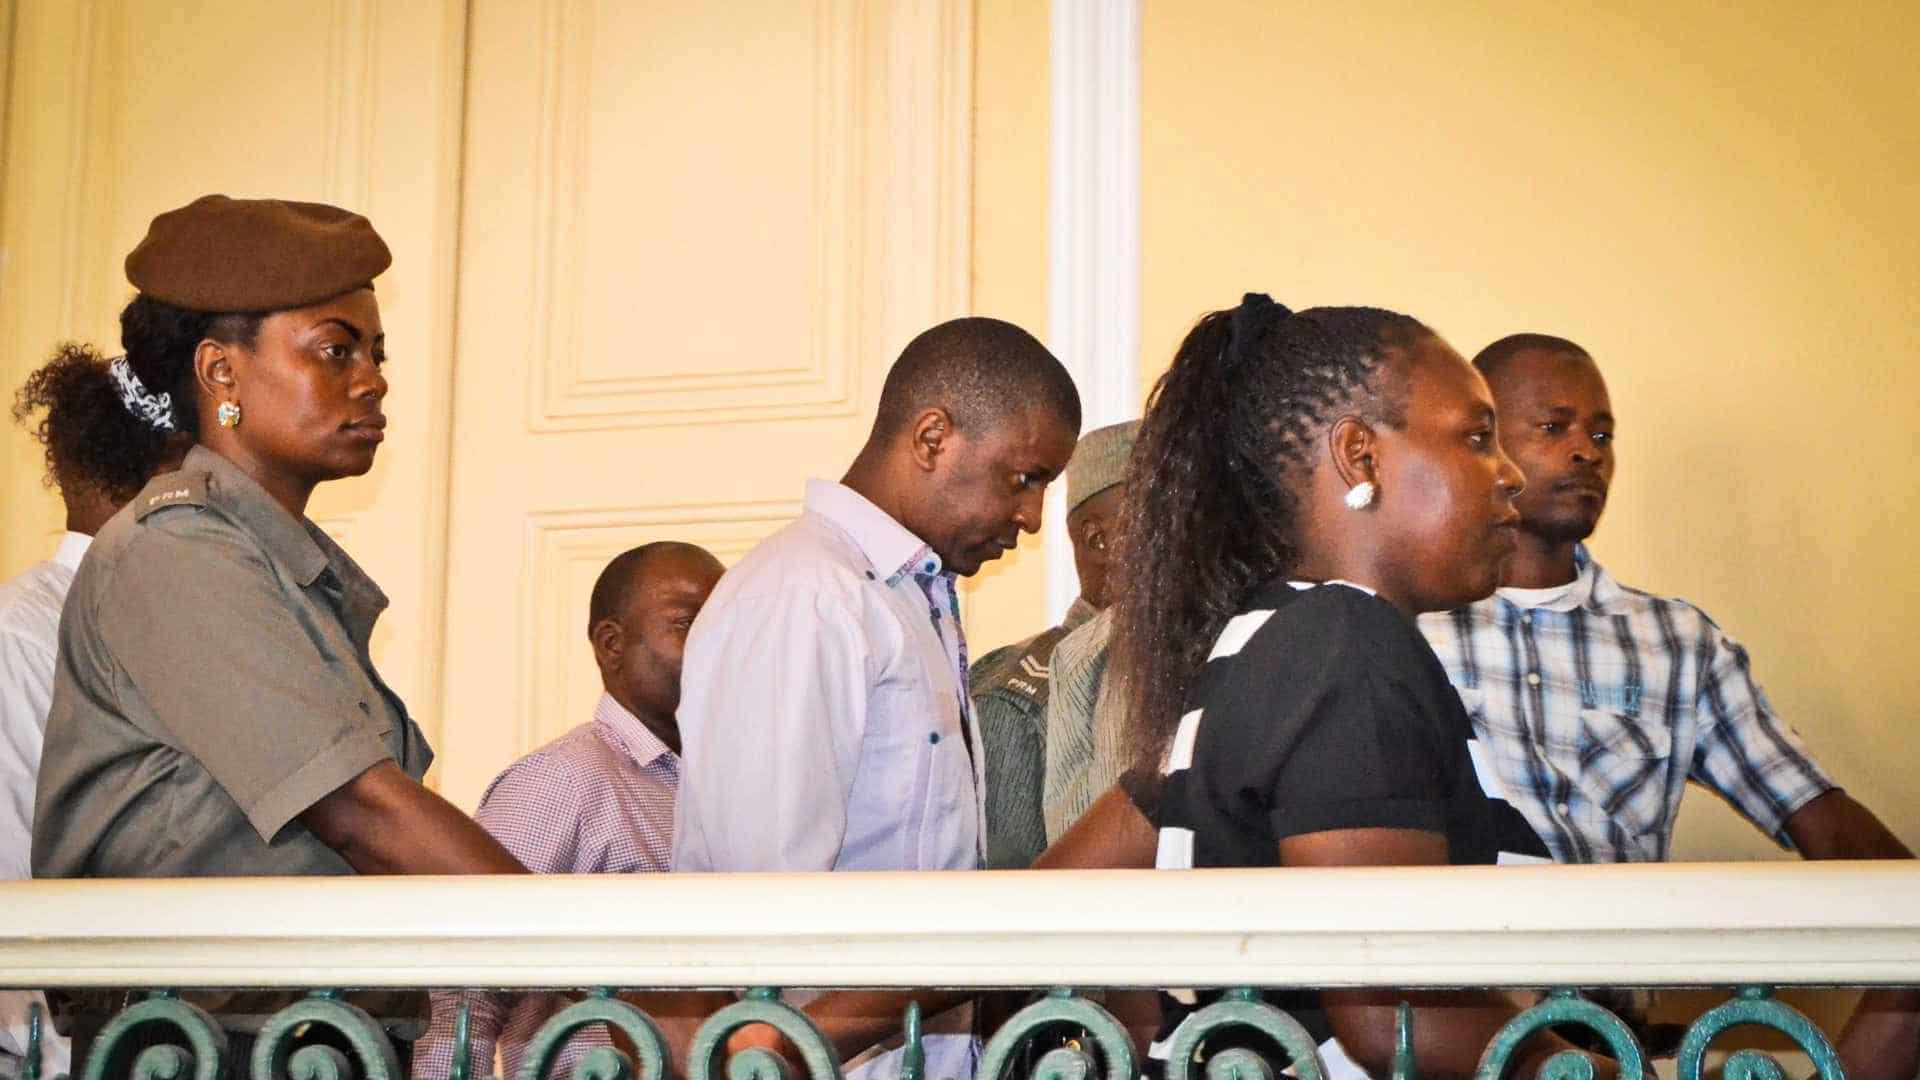 tribunal decreta prisão preventiva a filho de ex-presidente moçambicano - NDAMBI GUEBUZA - Tribunal decreta prisão preventiva a filho de ex-Presidente moçambicano